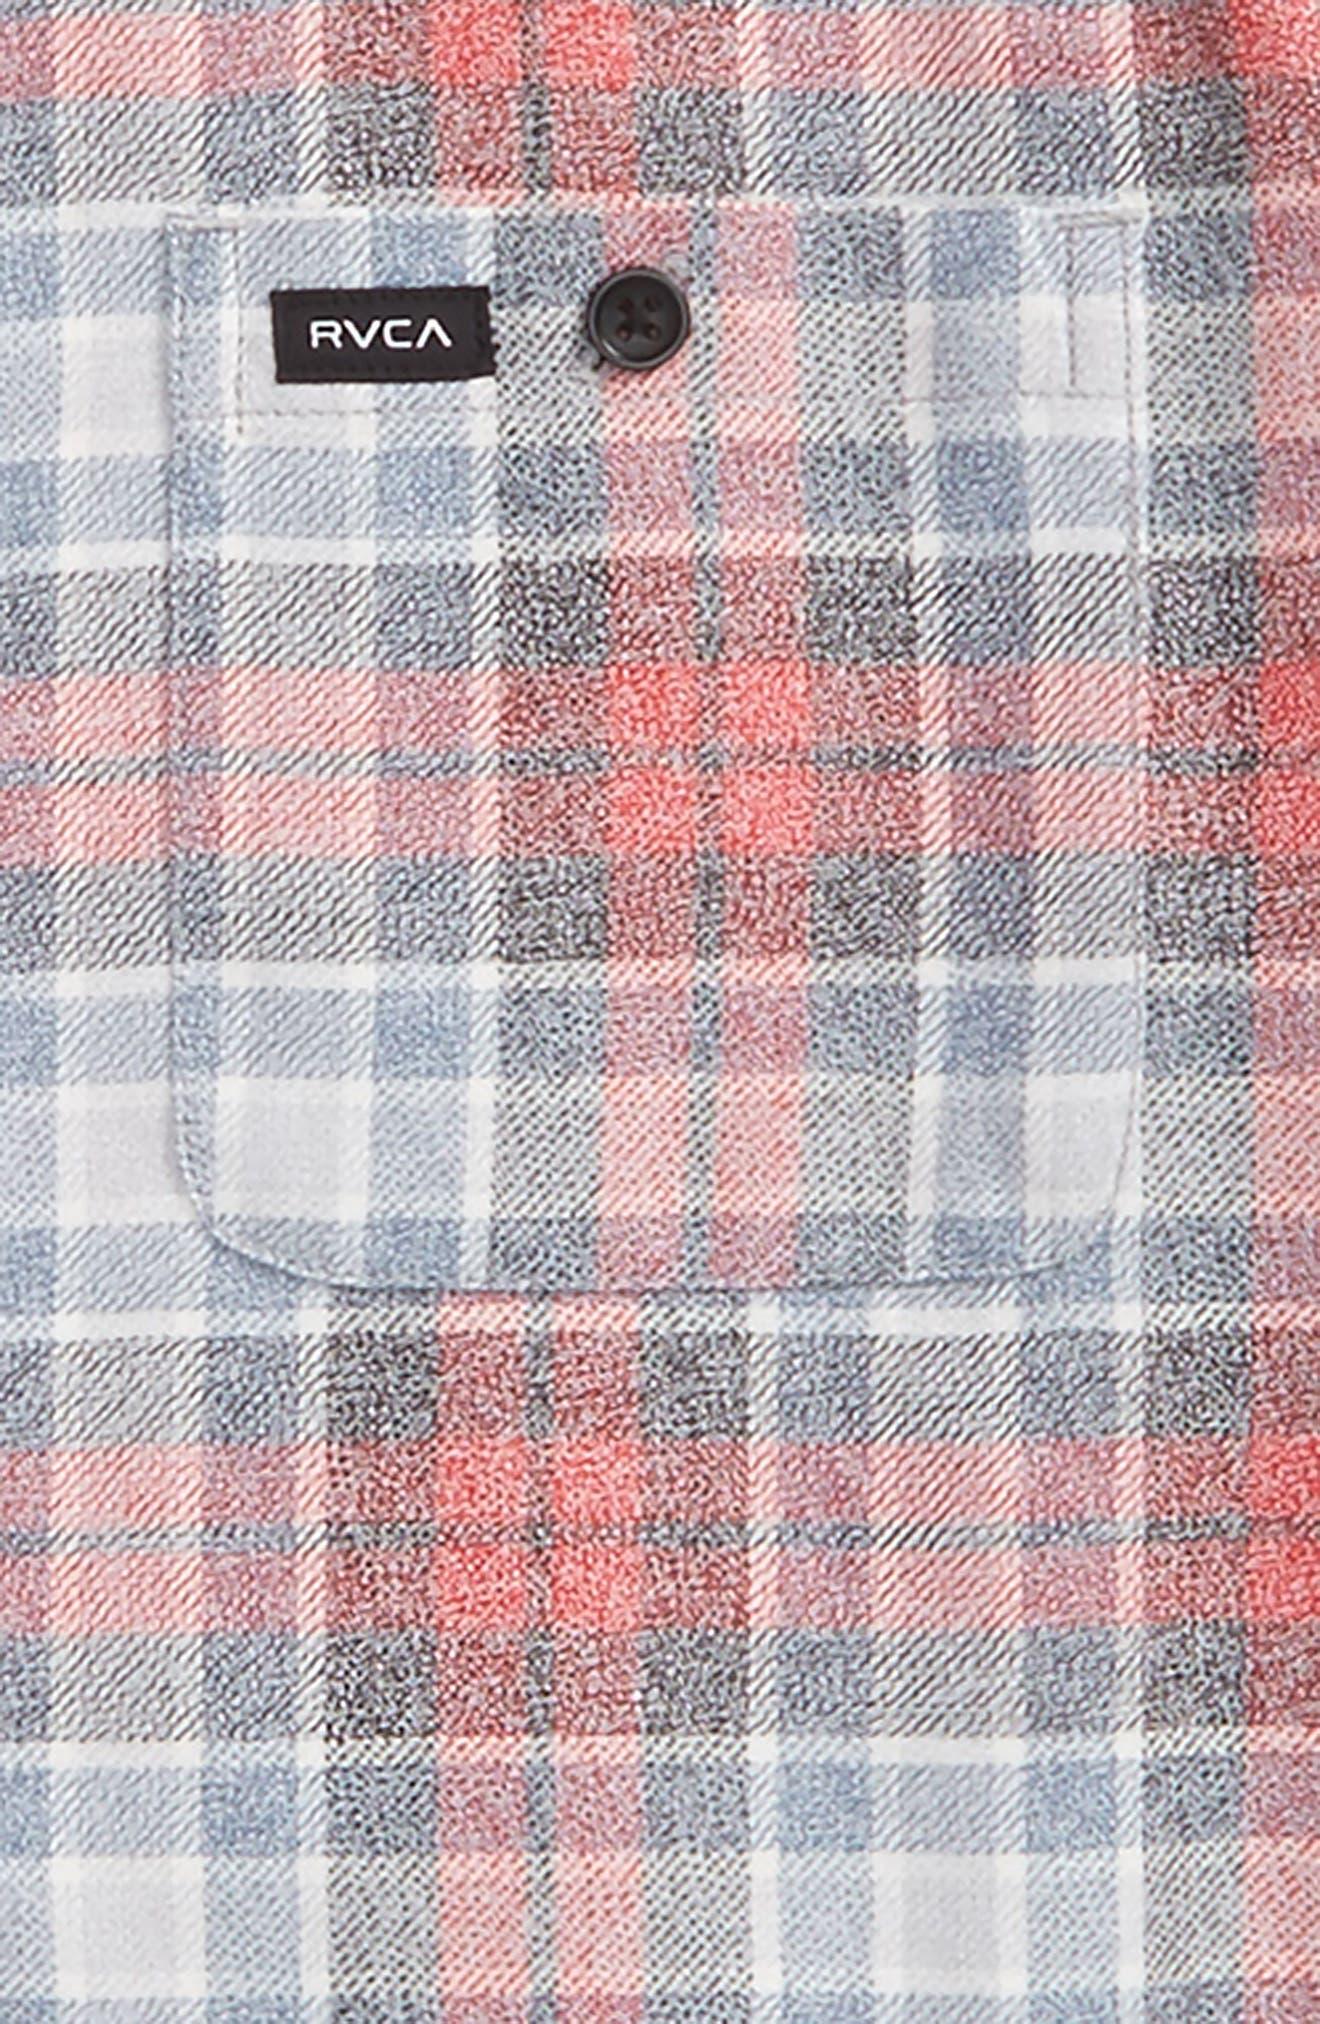 Diffusion Plaid Shirt,                             Alternate thumbnail 2, color,                             Pirate Black